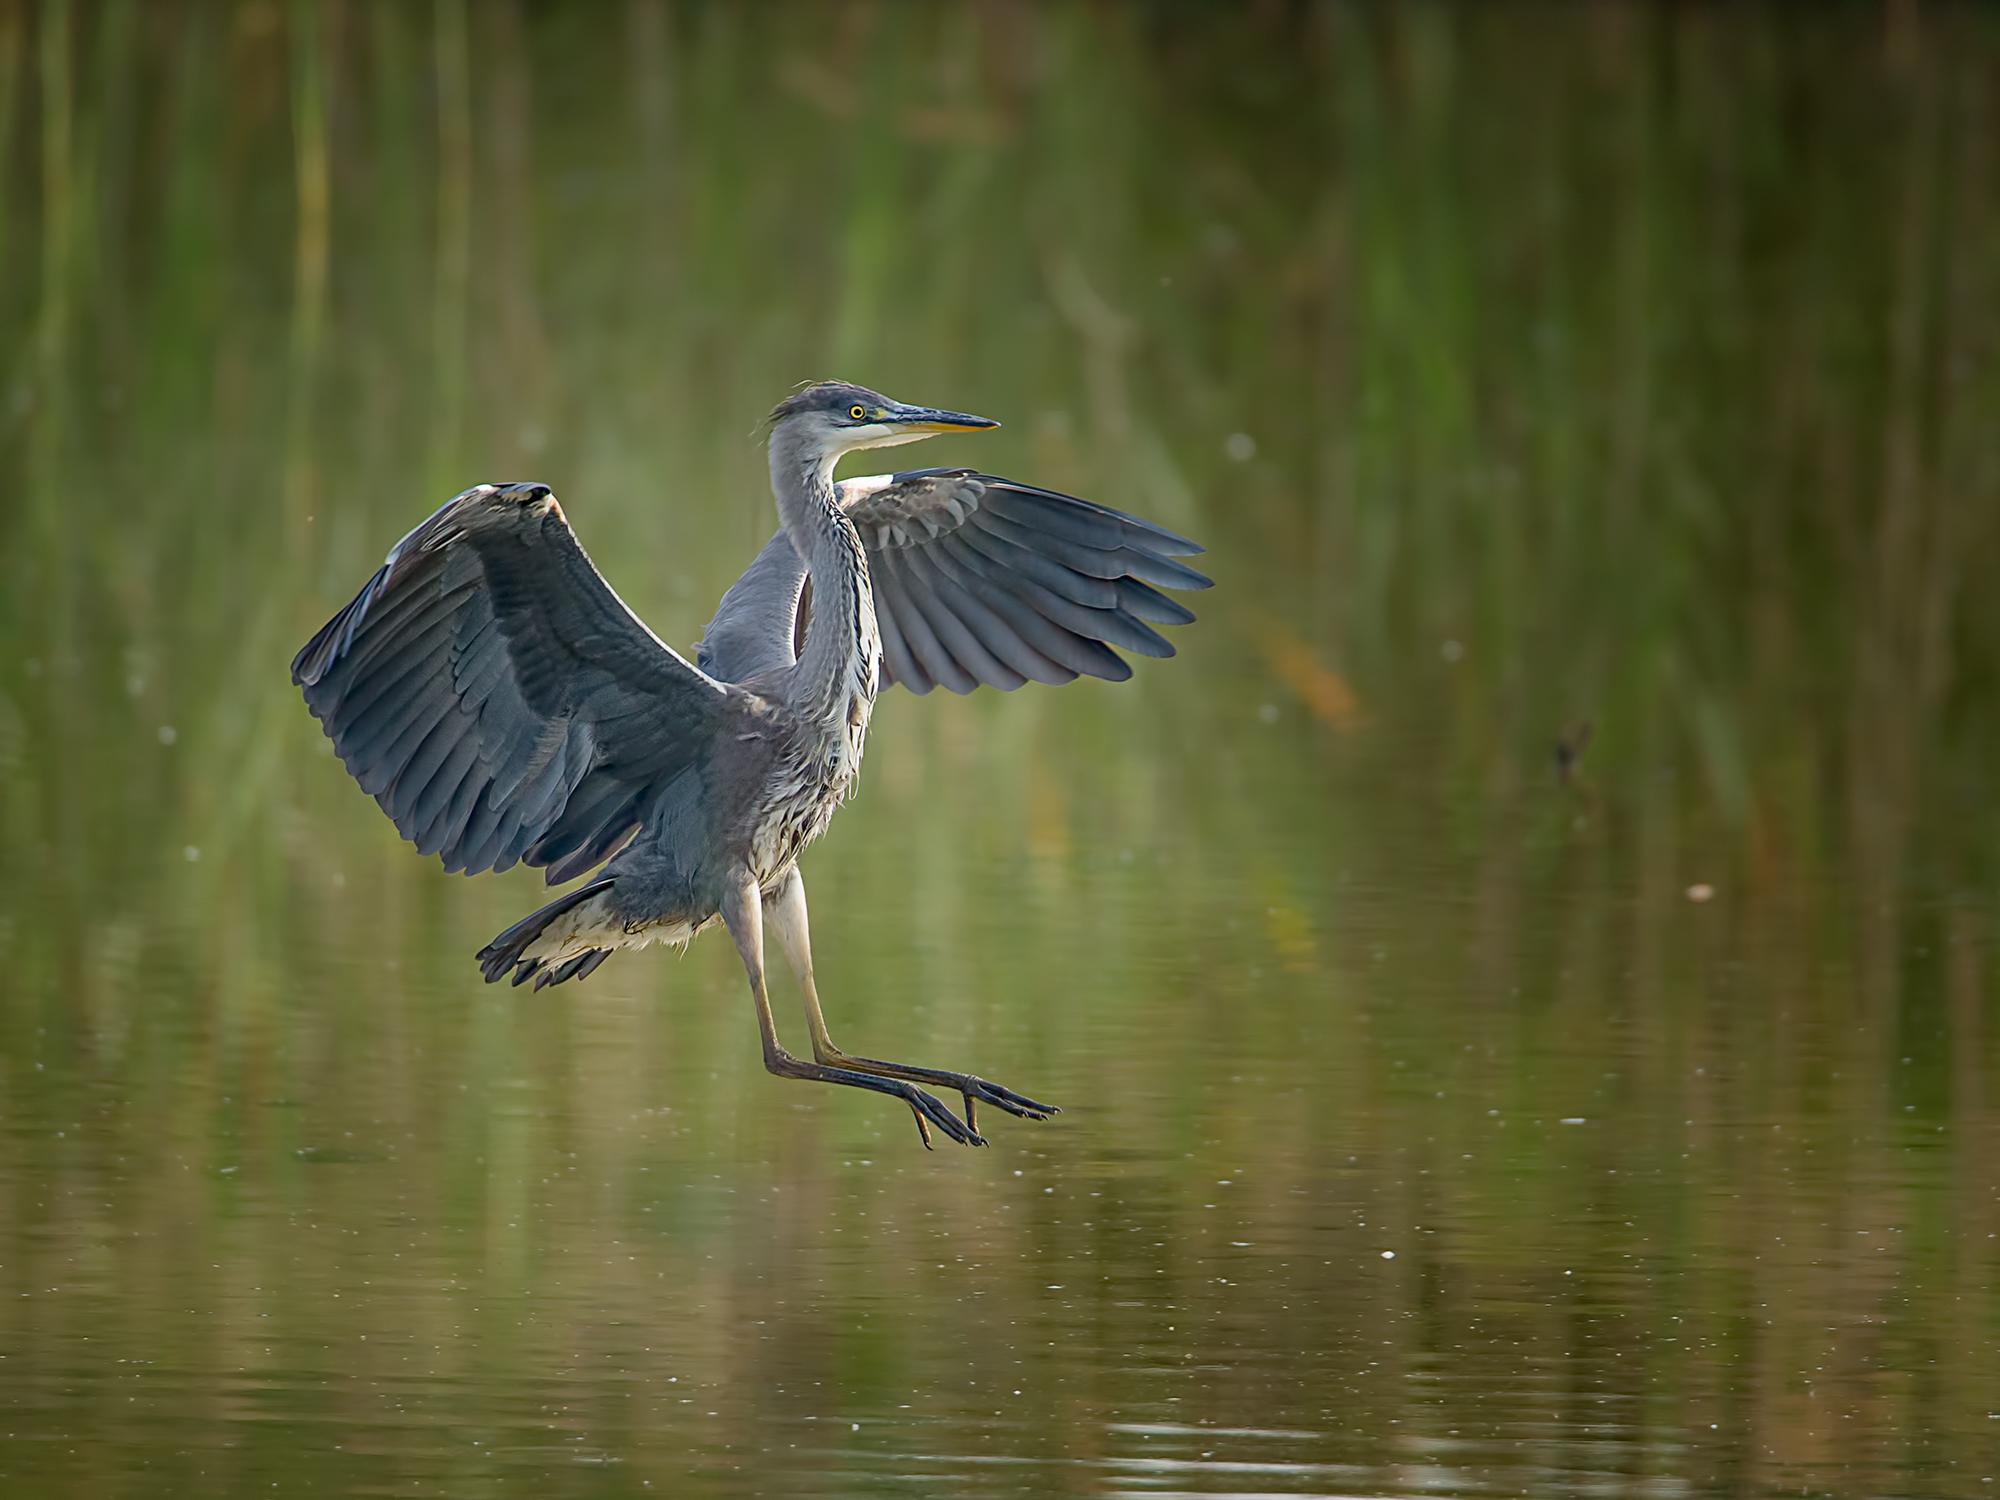 Heron Touchdown